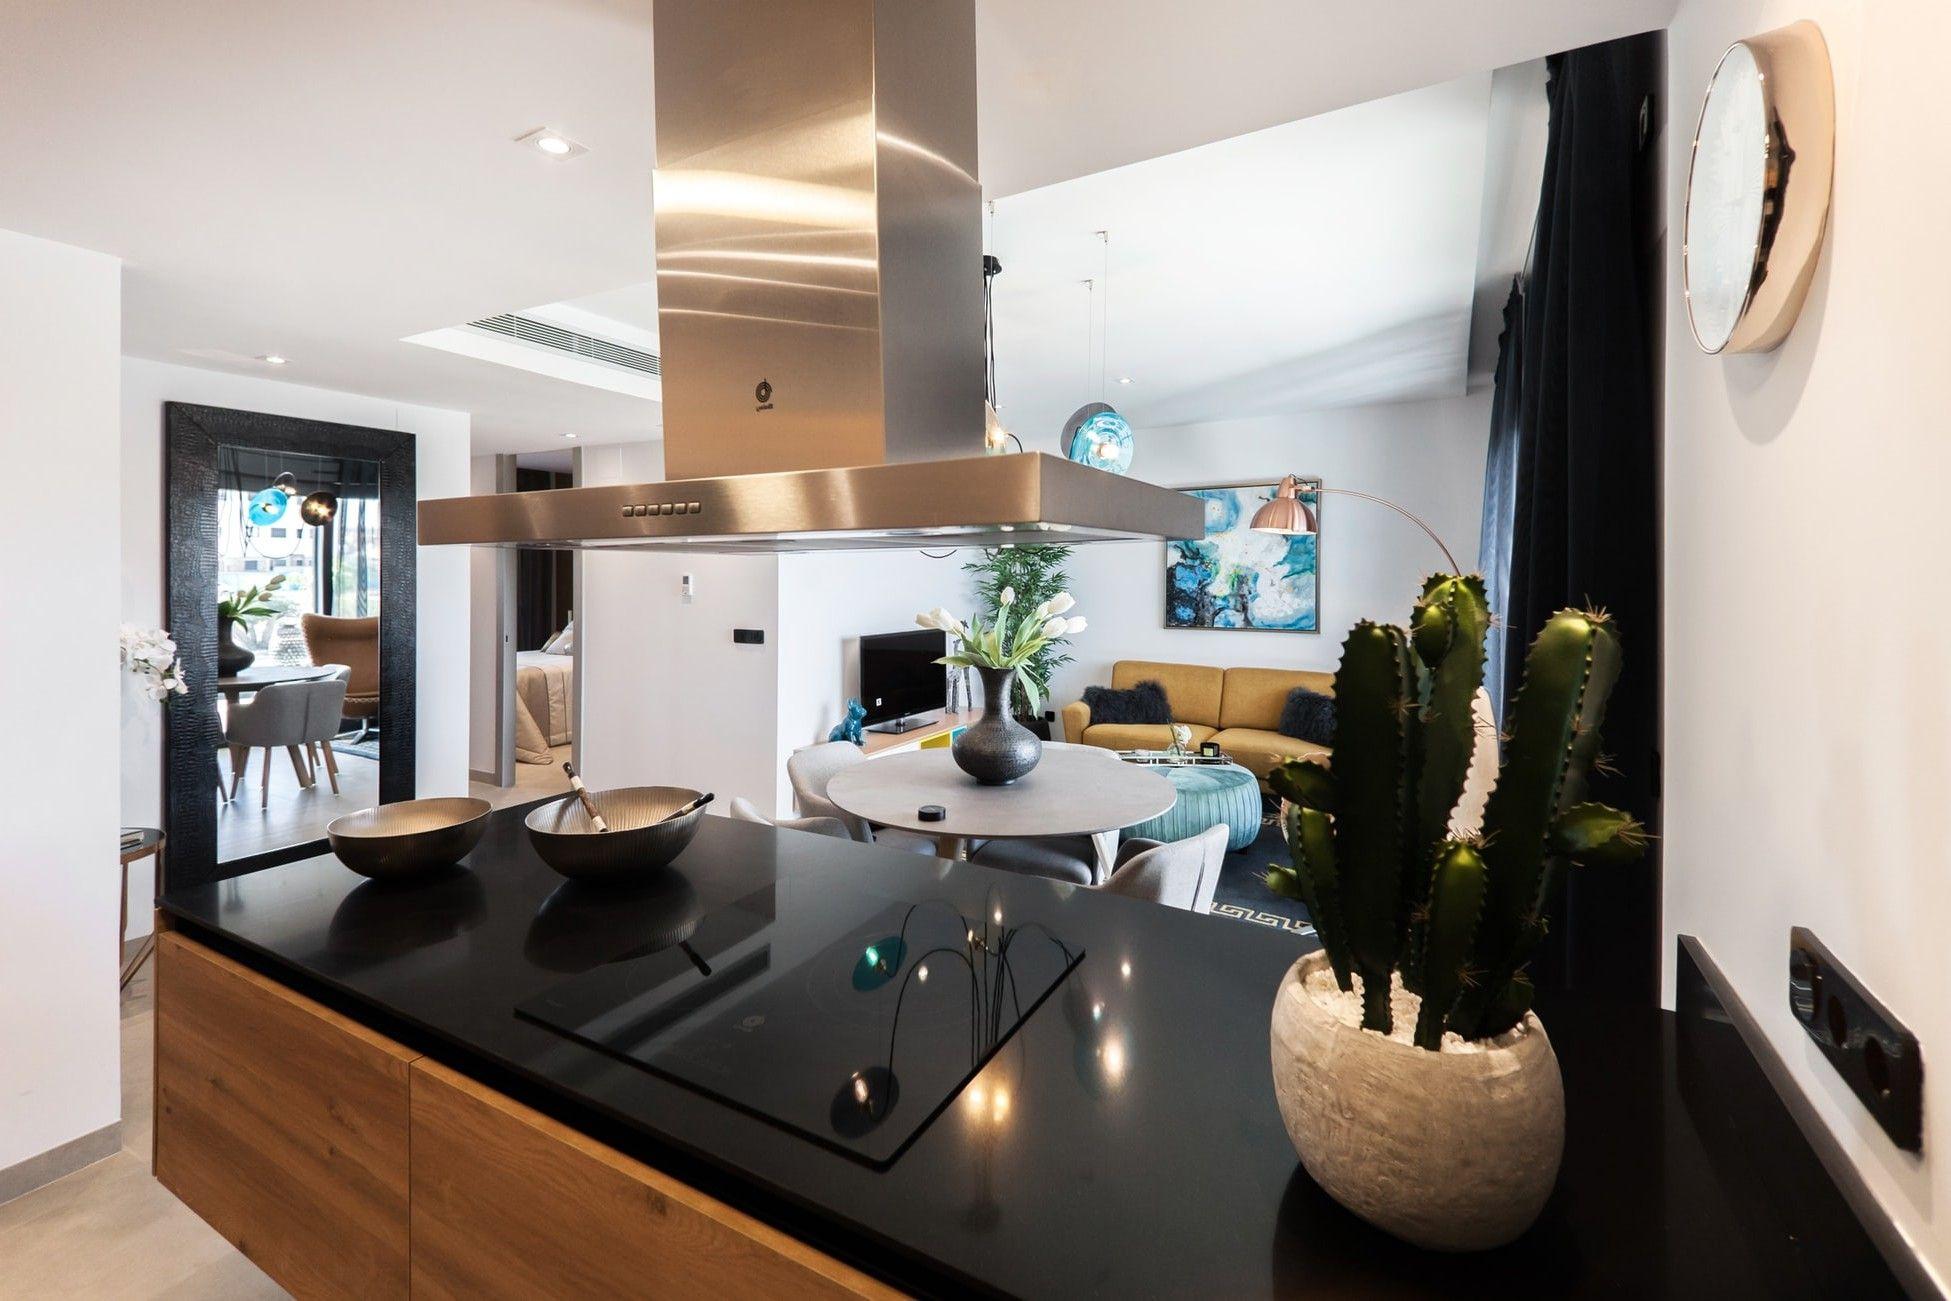 Moderne Kocharbeitsplatte Mit Flachem Schwarzem Elektroherd